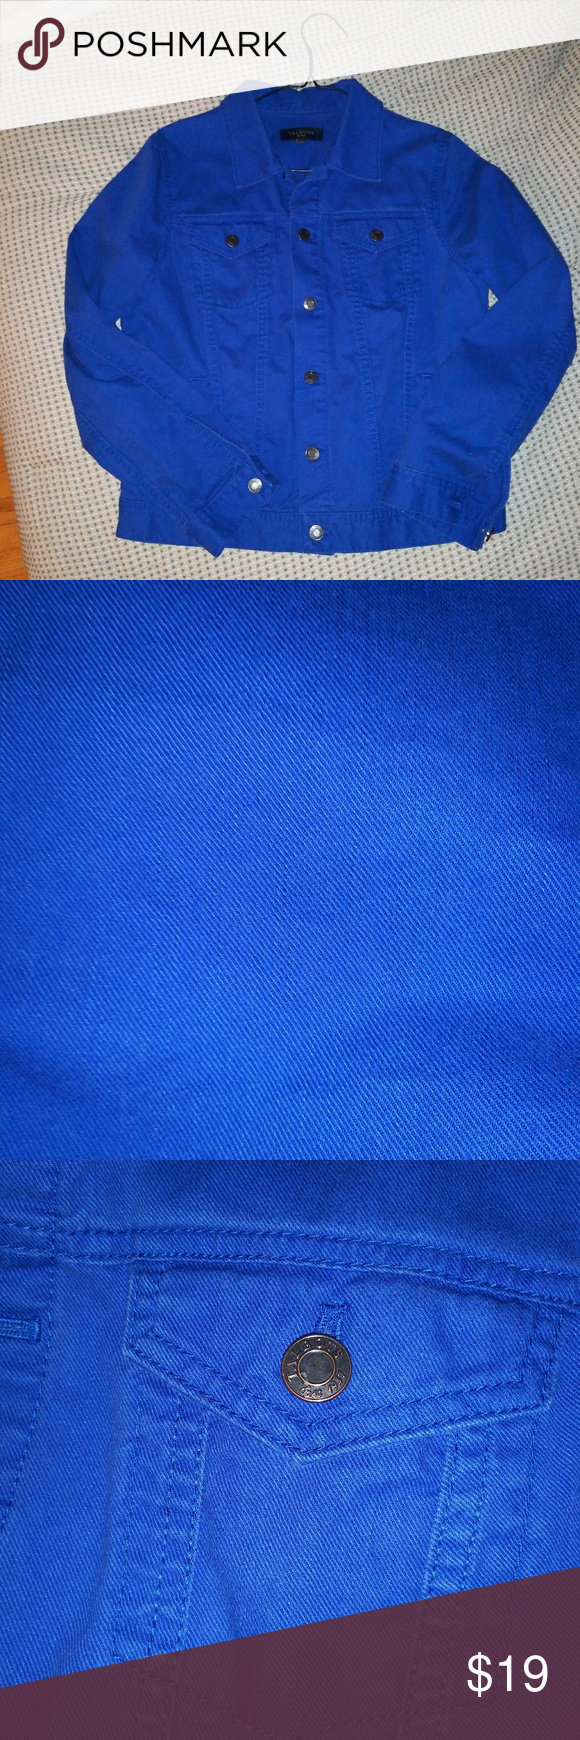 Vintage Blue Denim Jacket Blue Denim Jacket Vintage Denim Coats Jackets Women [ 1740 x 580 Pixel ]